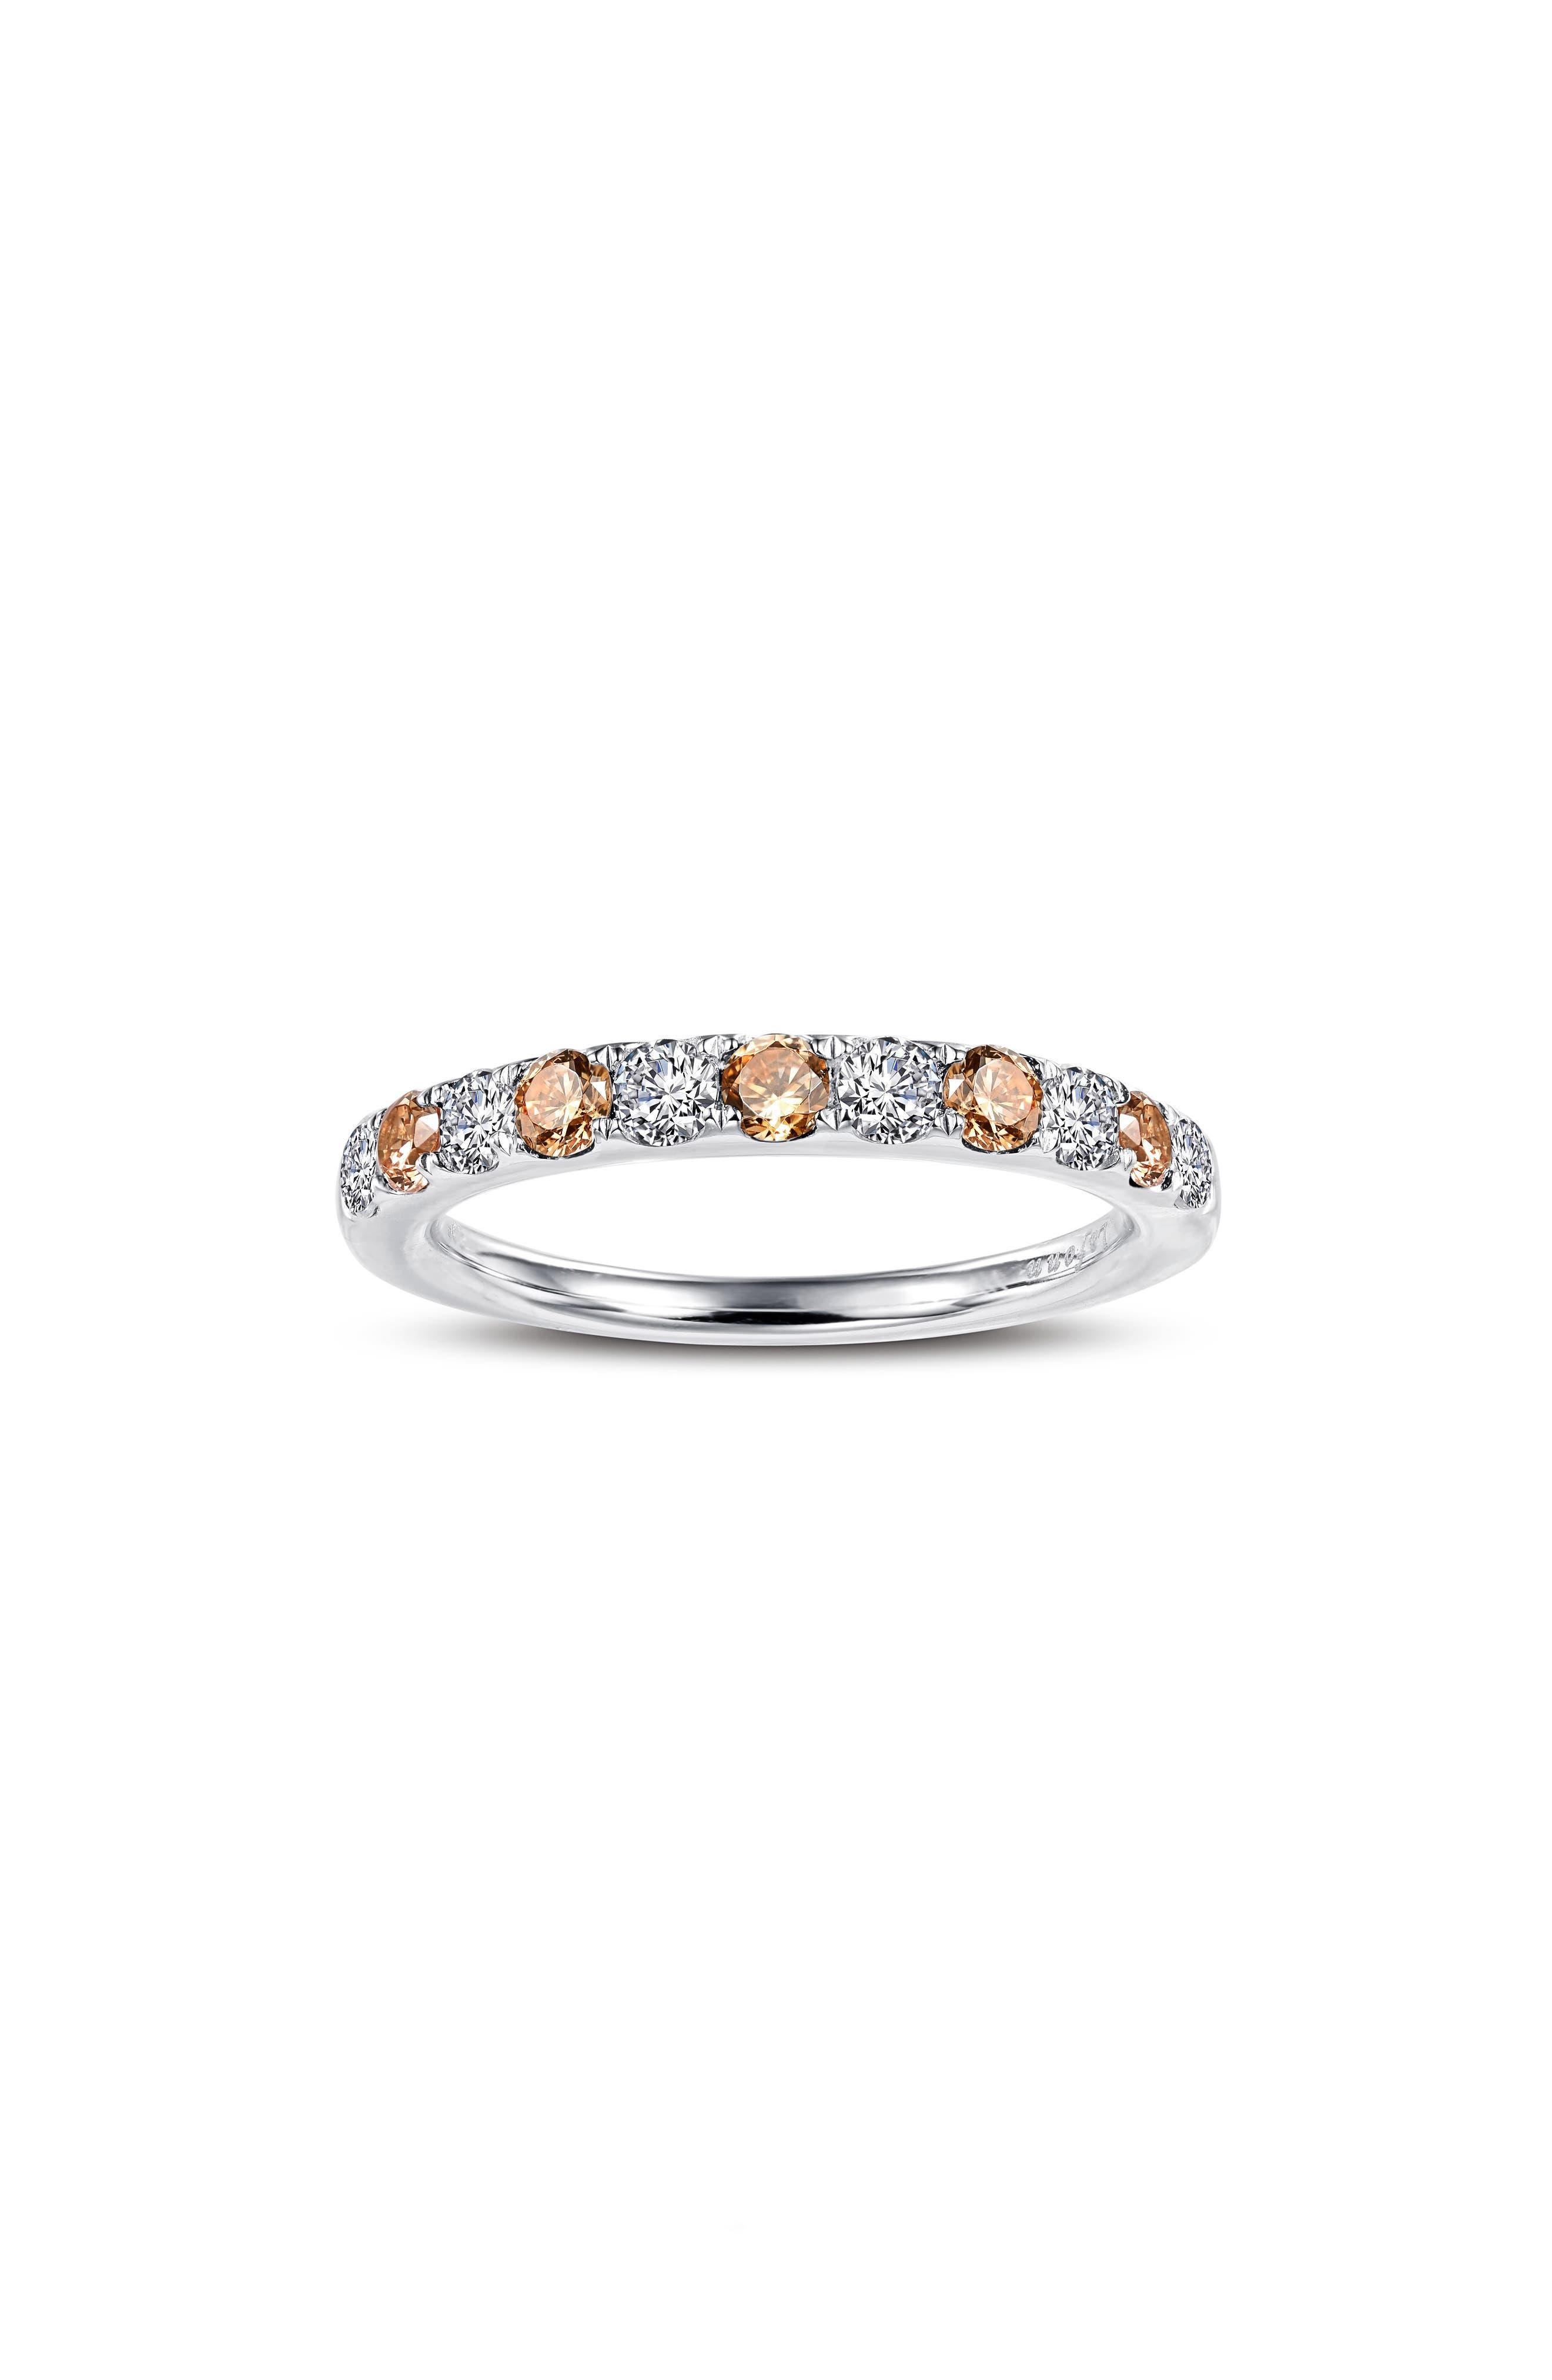 Simulated Diamond Birthstone Band Ring